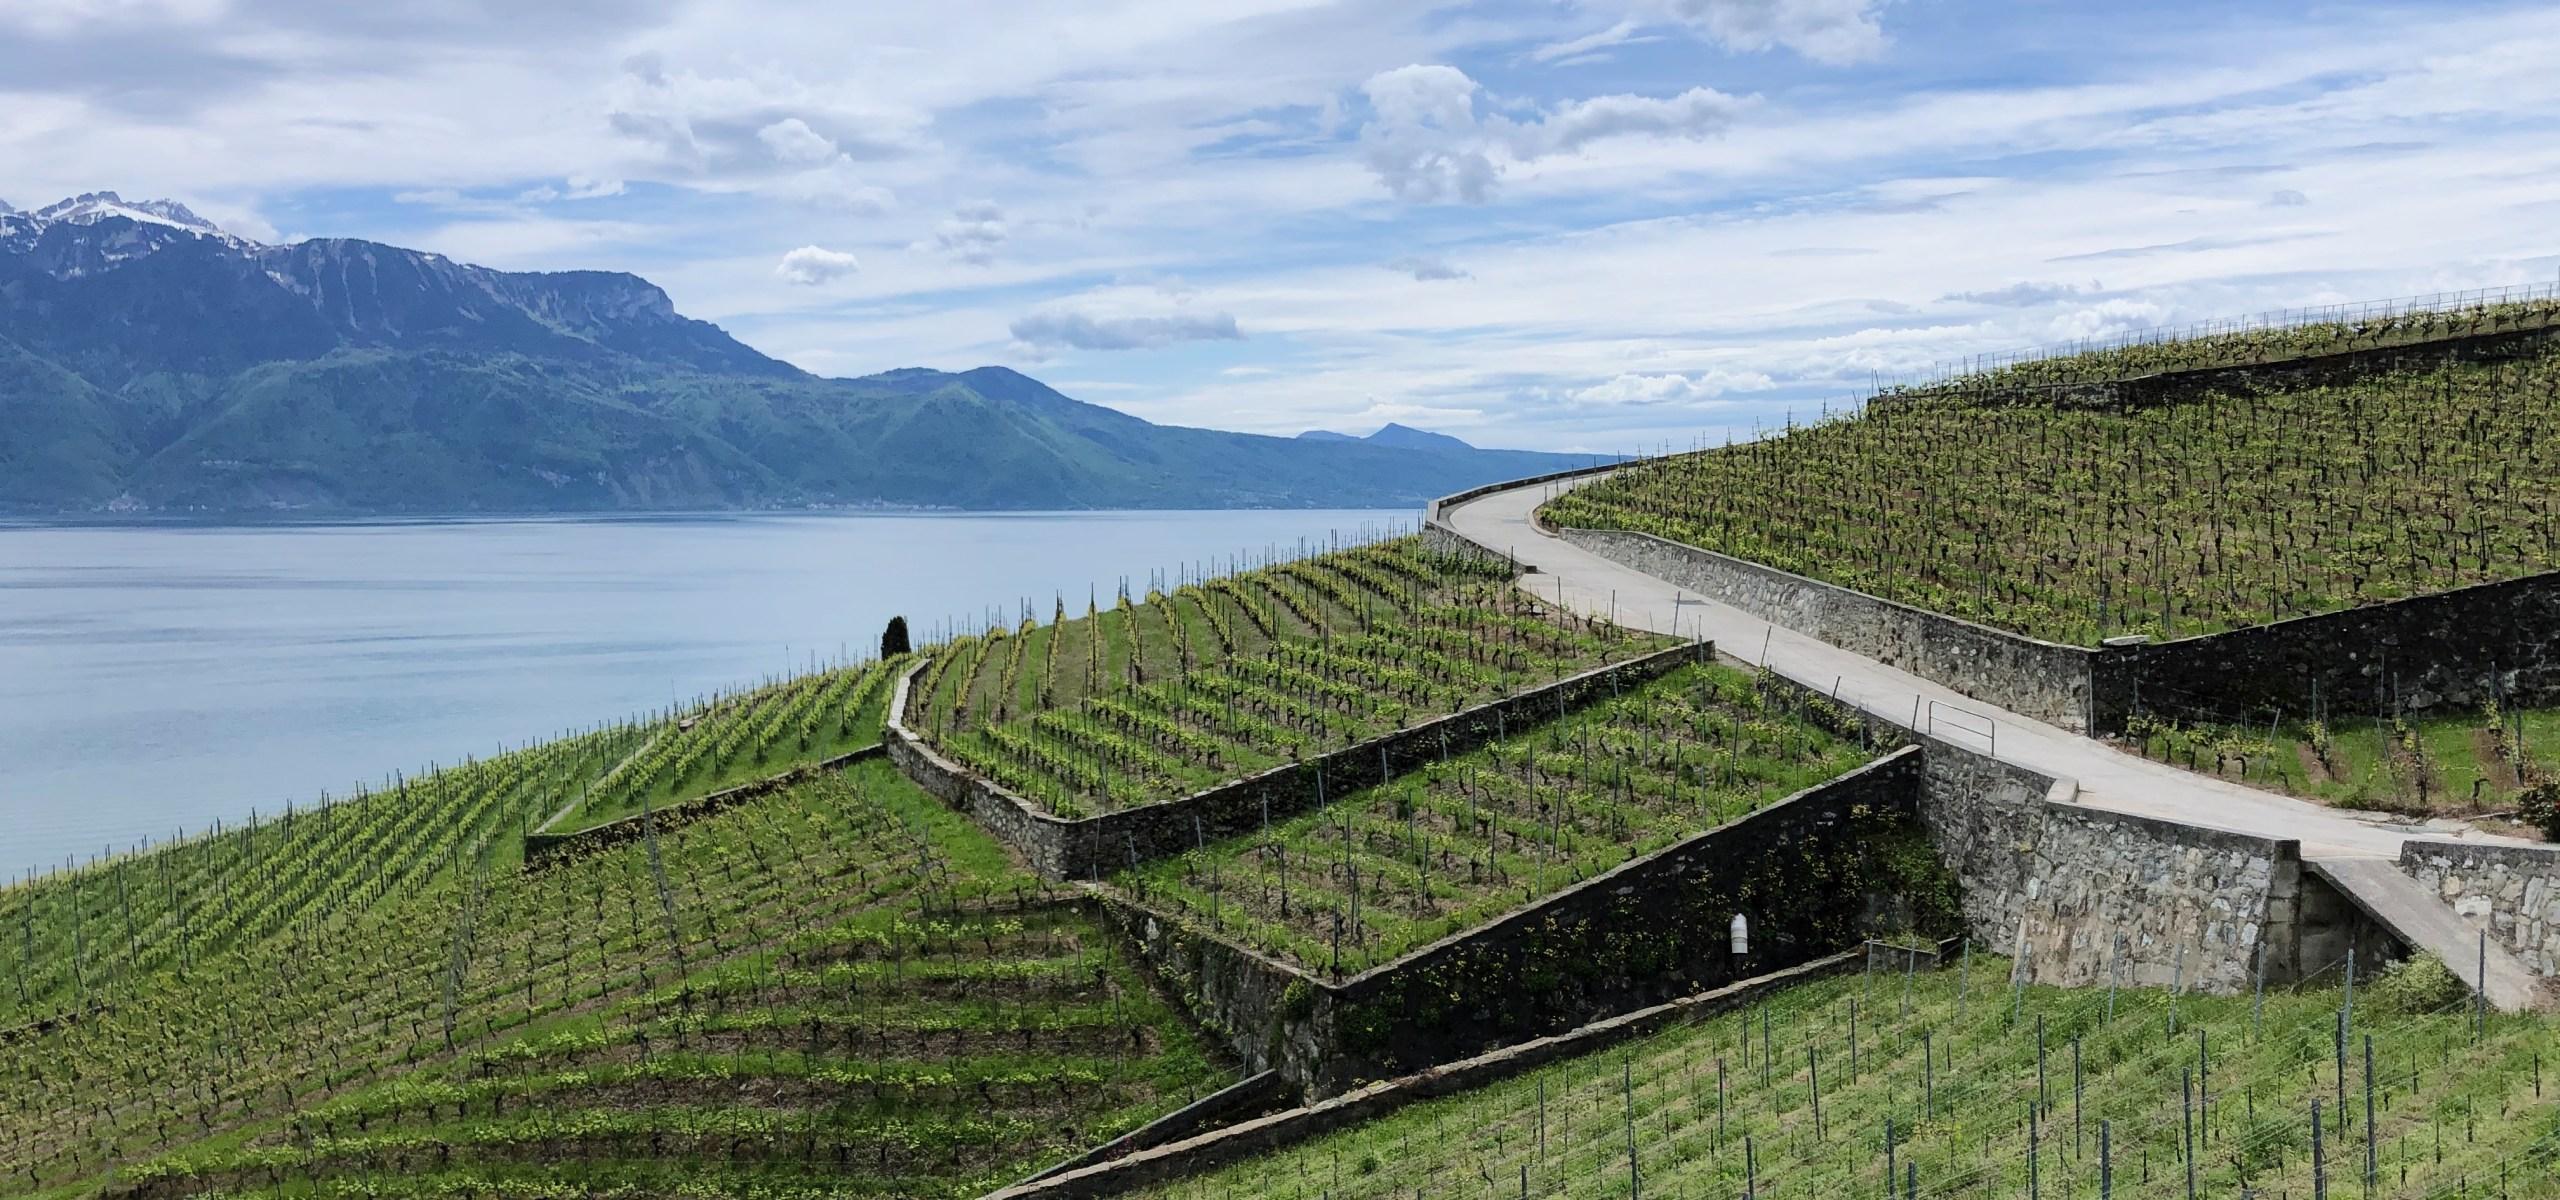 Lavaux vineyards walk